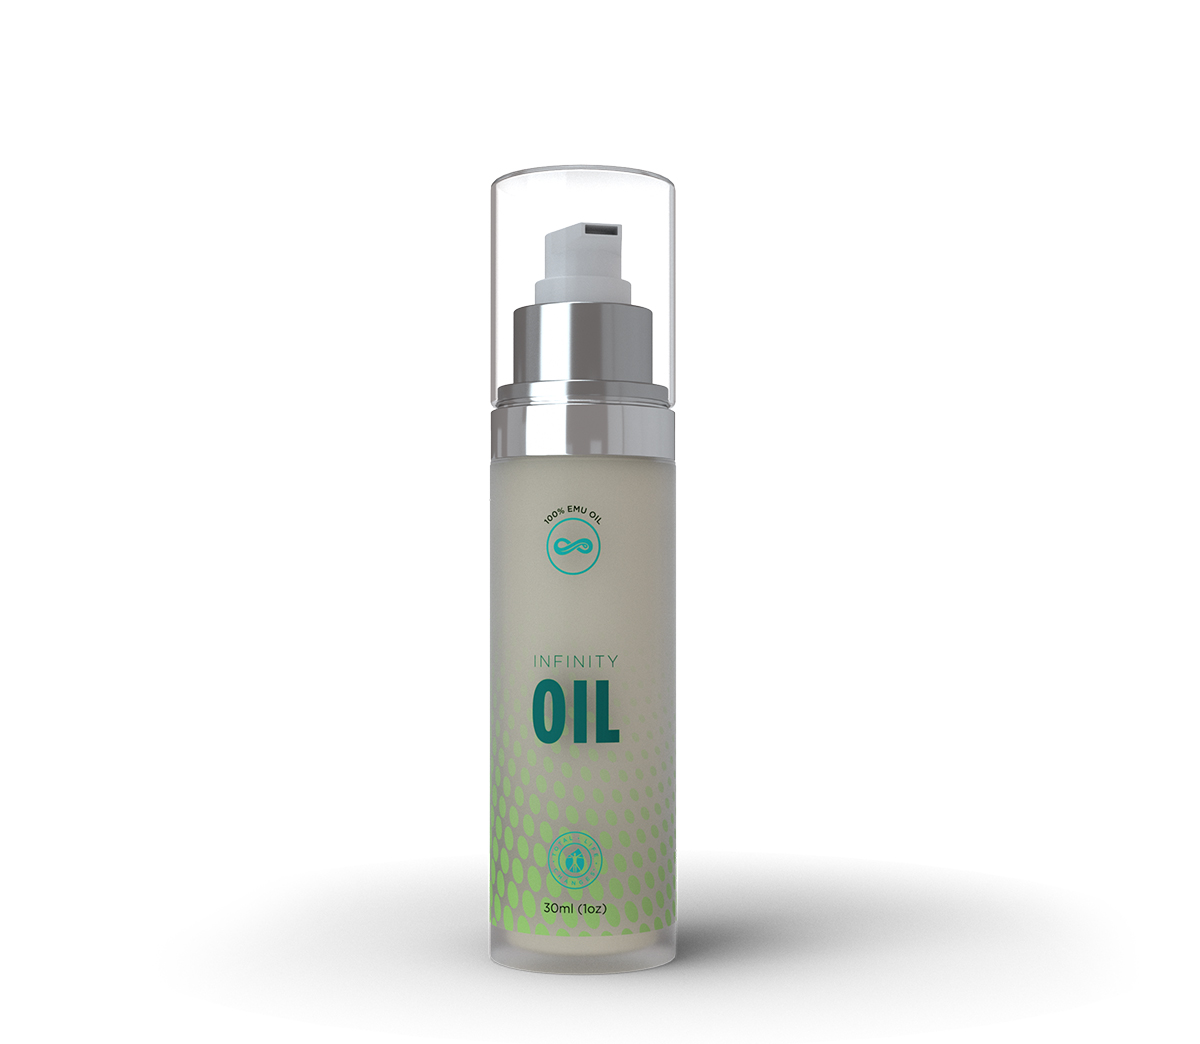 Infinity Oil - $29.95 USD